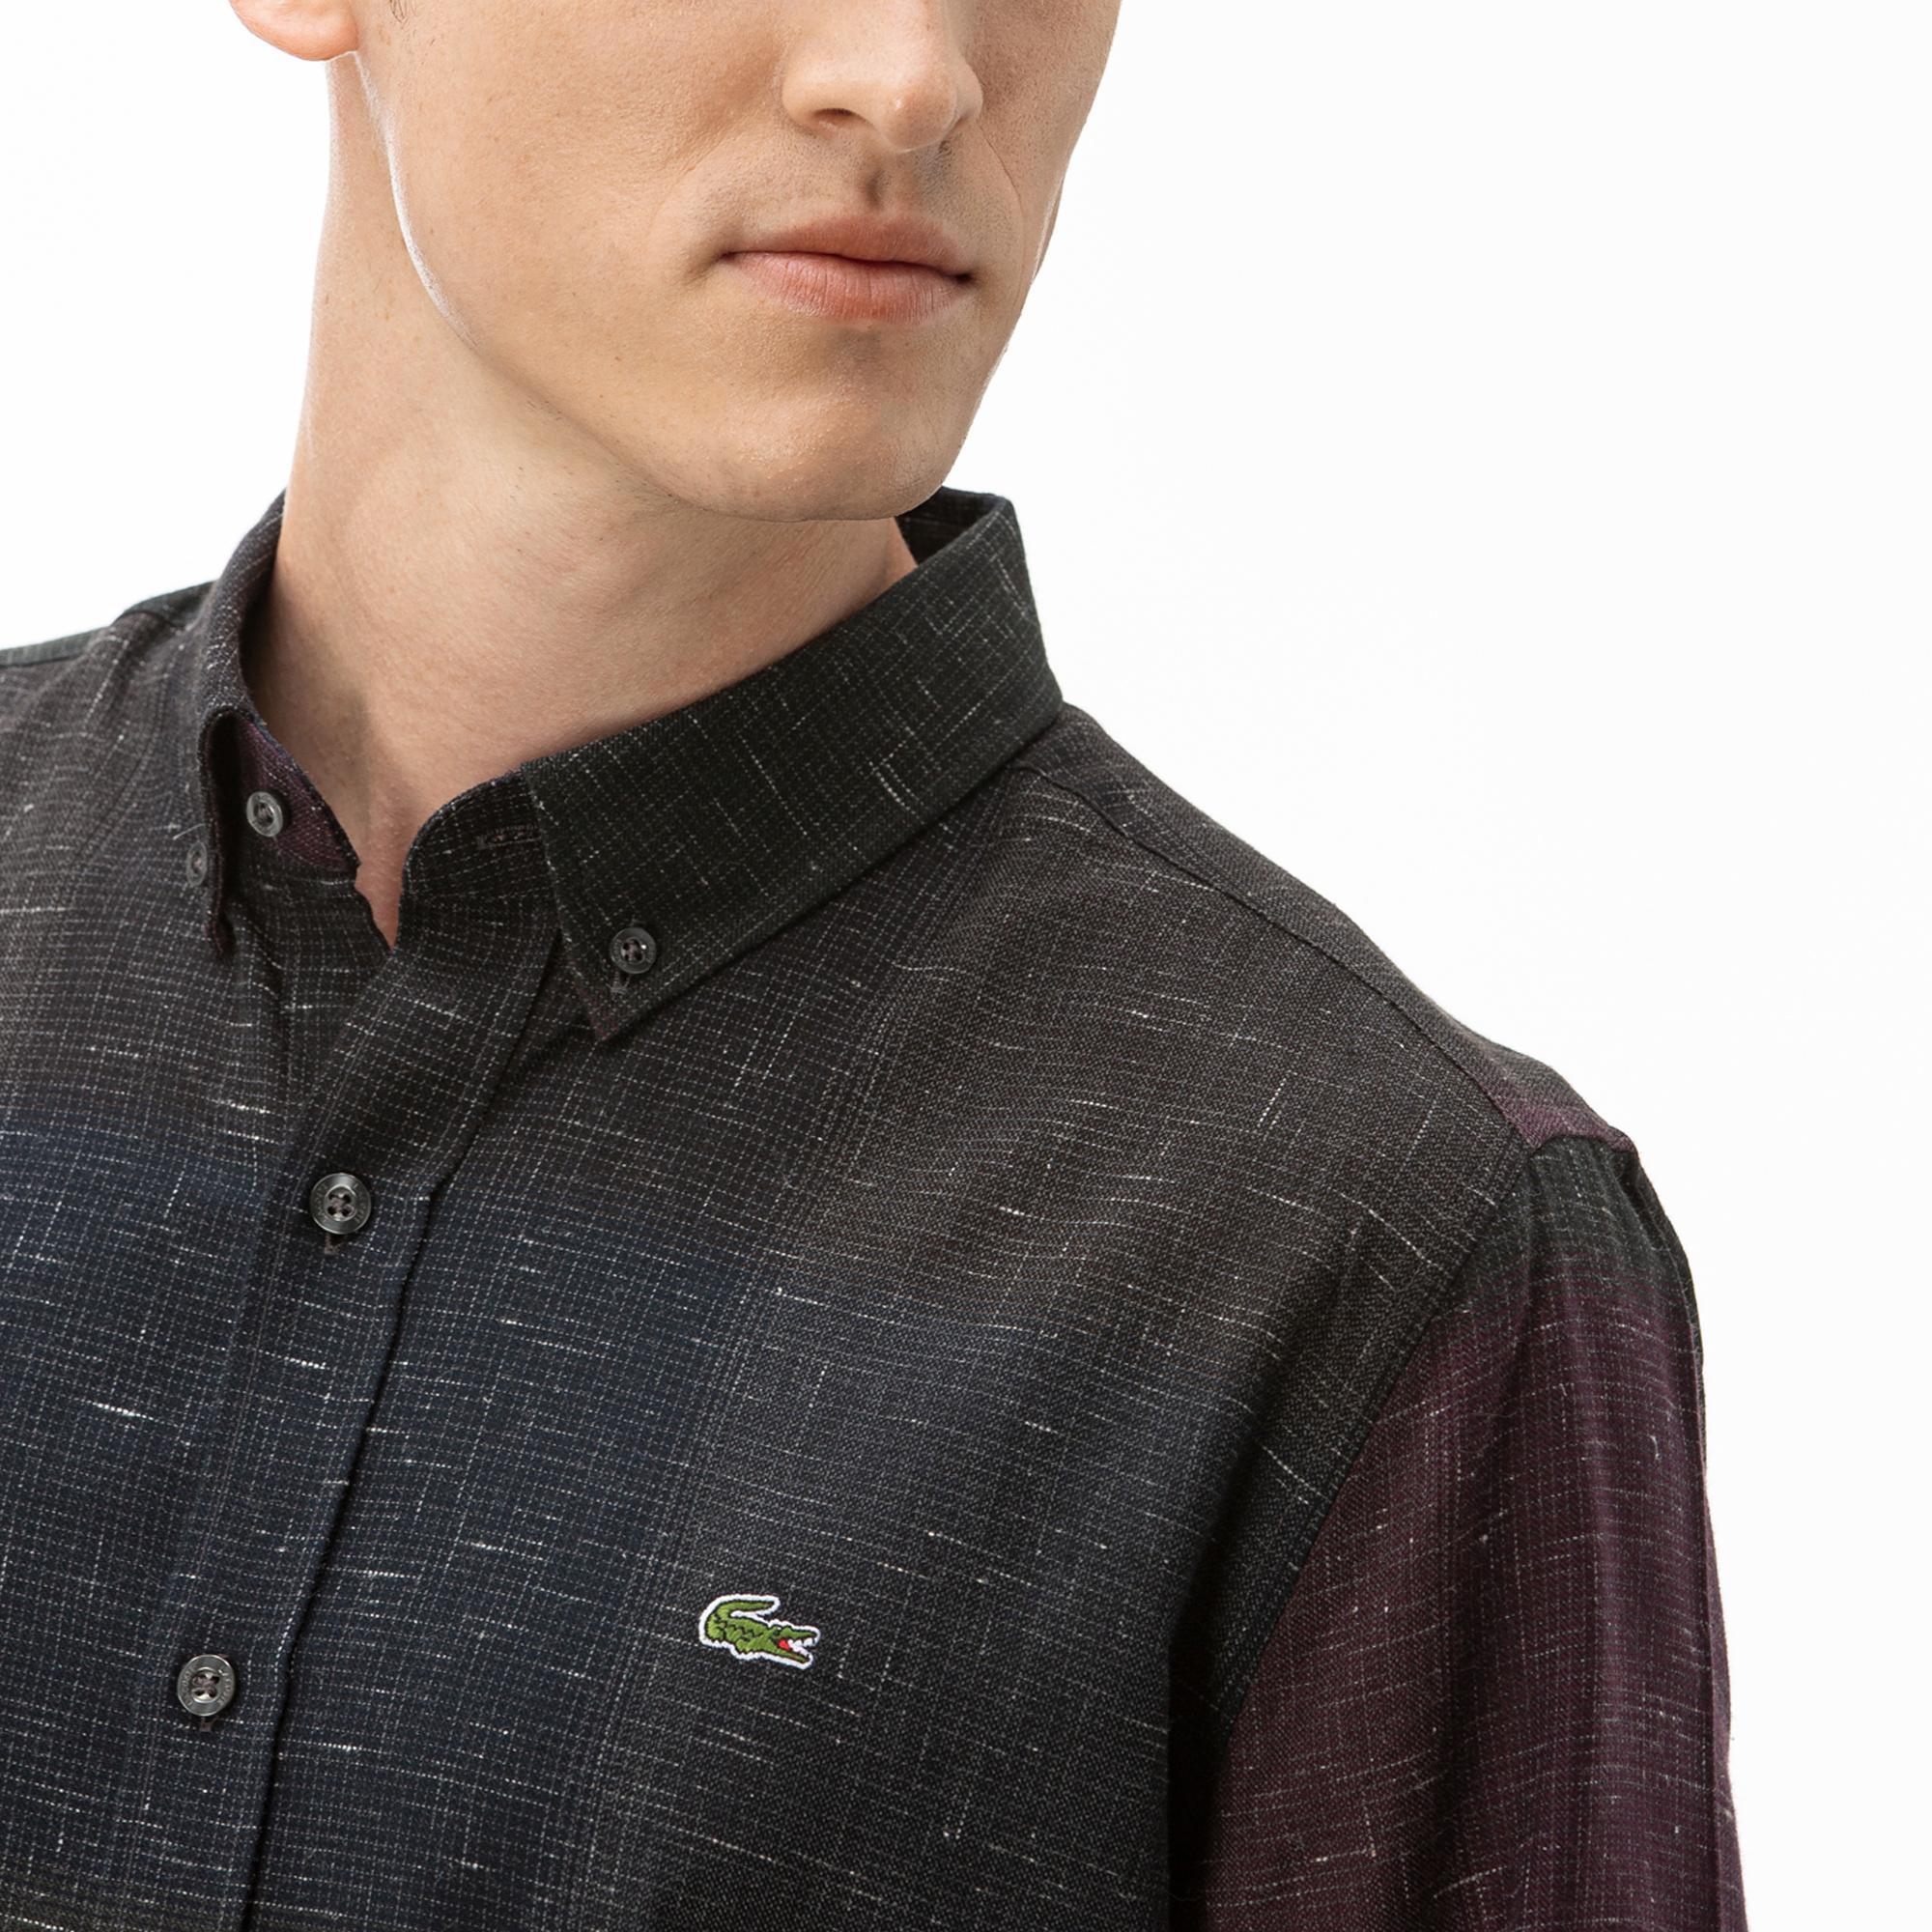 Lacoste Erkek Slim Fit Blok Desenli Bordo Gömlek